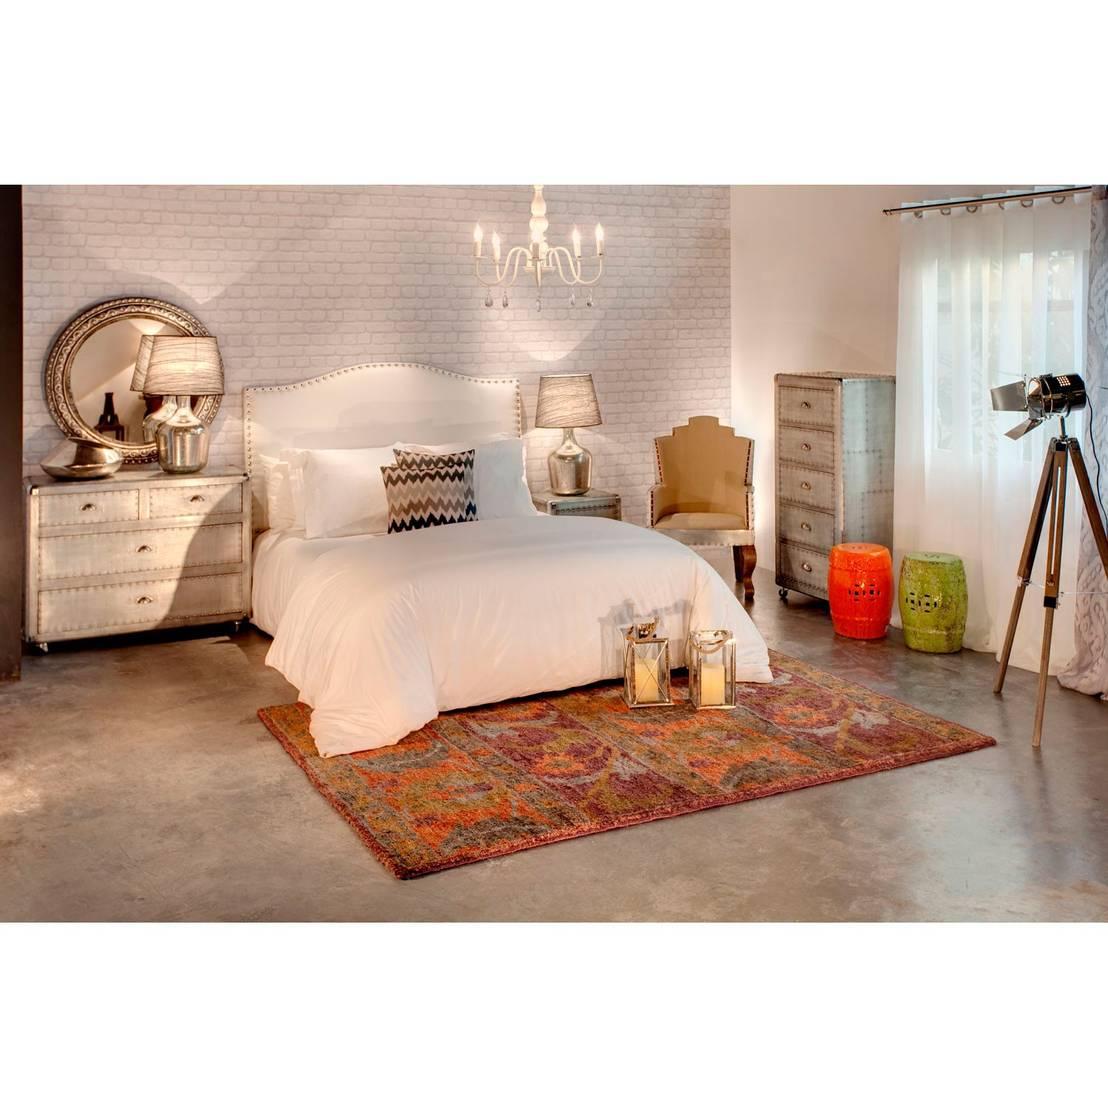 Muebles plata mate de muebles la toskana homify for Muebles la toskana